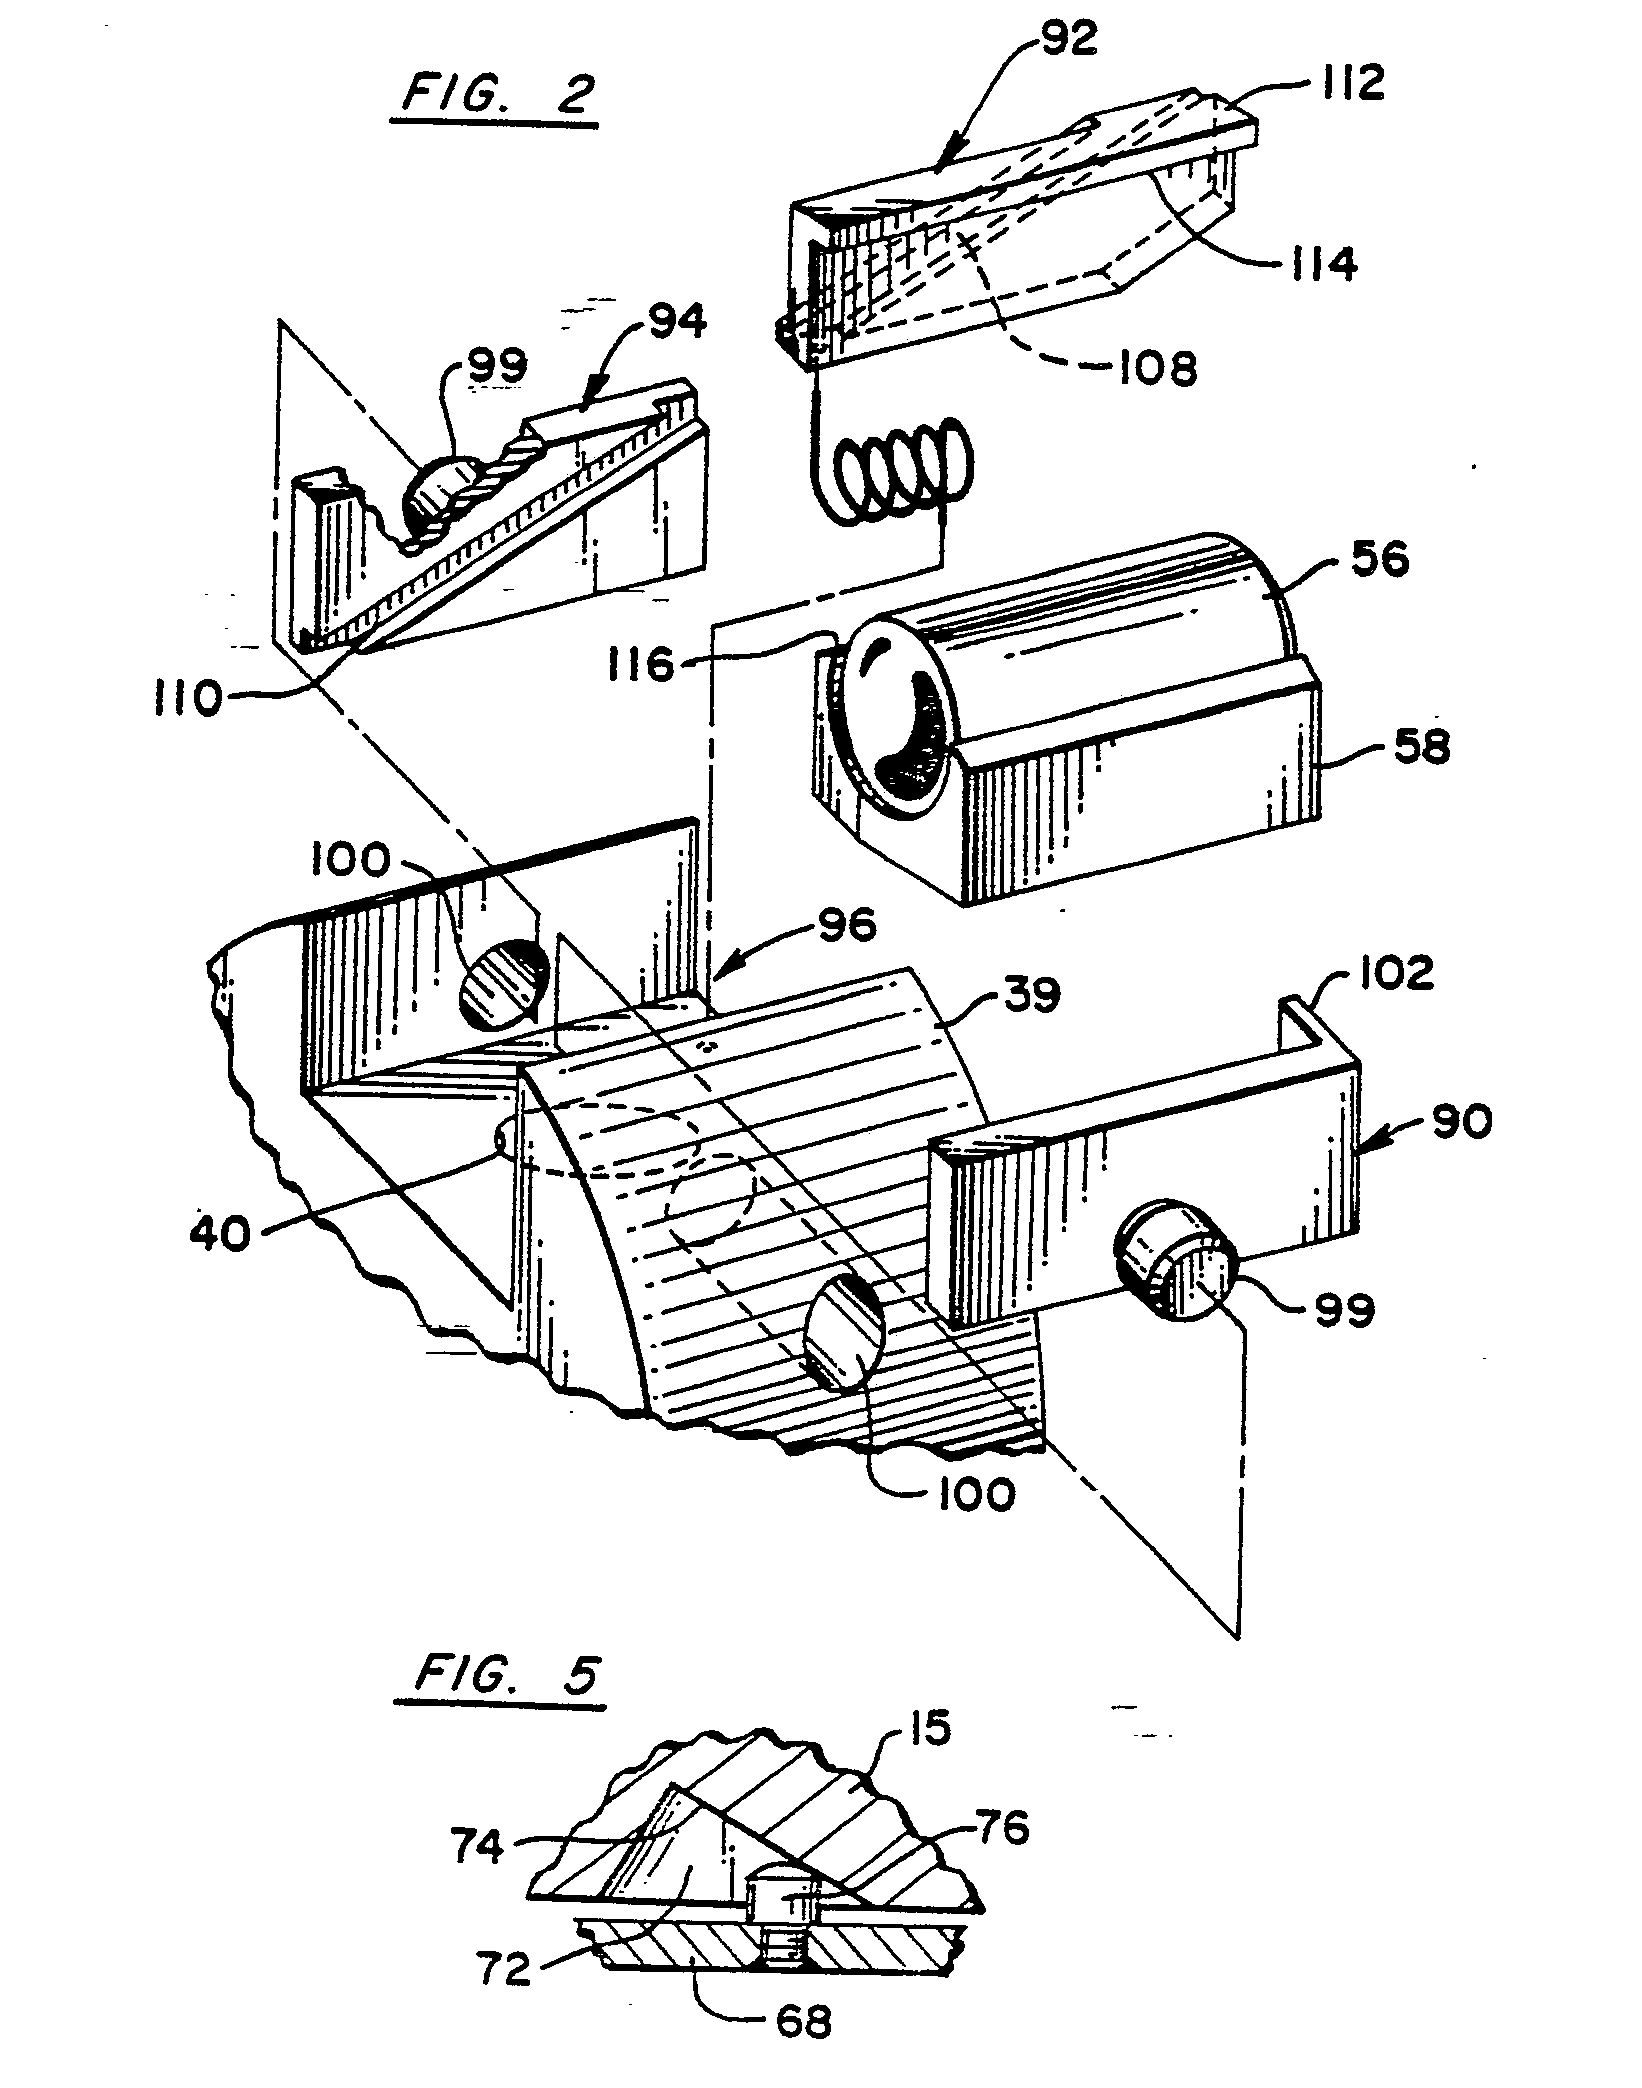 B2600 Mazda Stereo Wiring Manual Of Diagram 1988 1991 Fuse Box Imageresizertool Com Radio